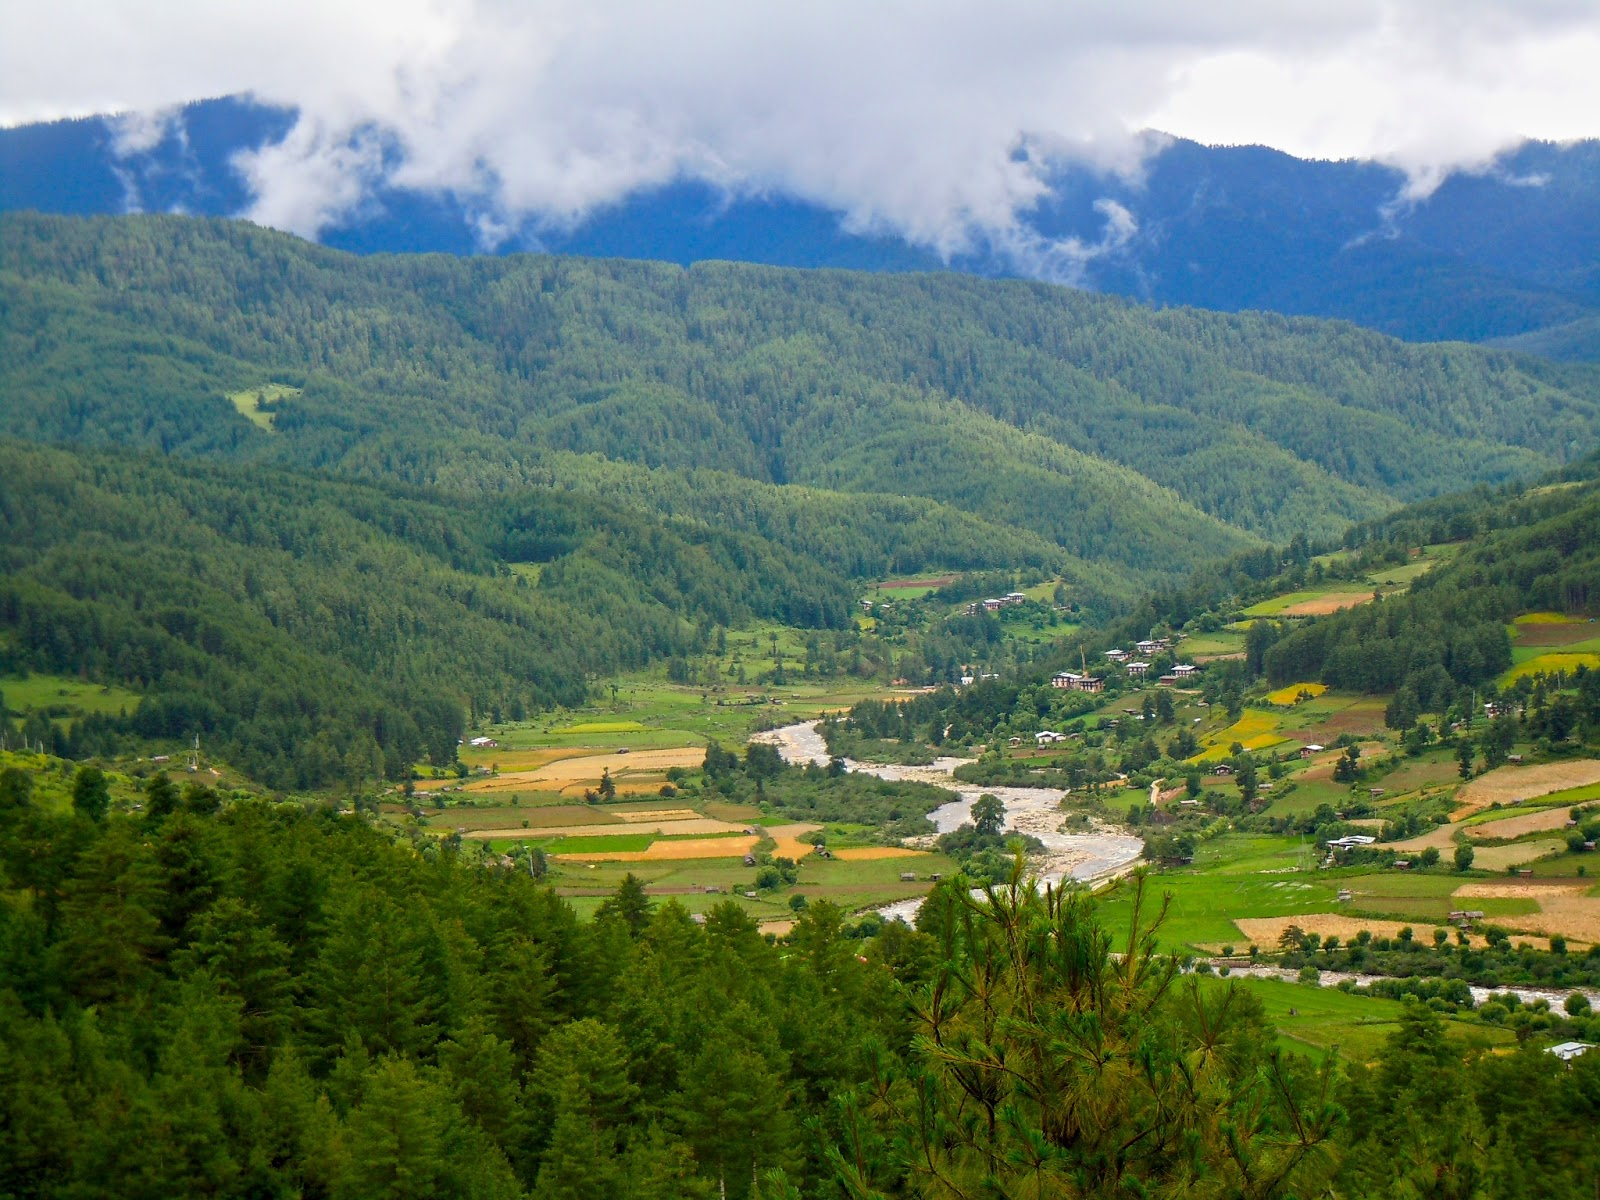 Handpicked Bhutan - Tang Valley, Bhutan